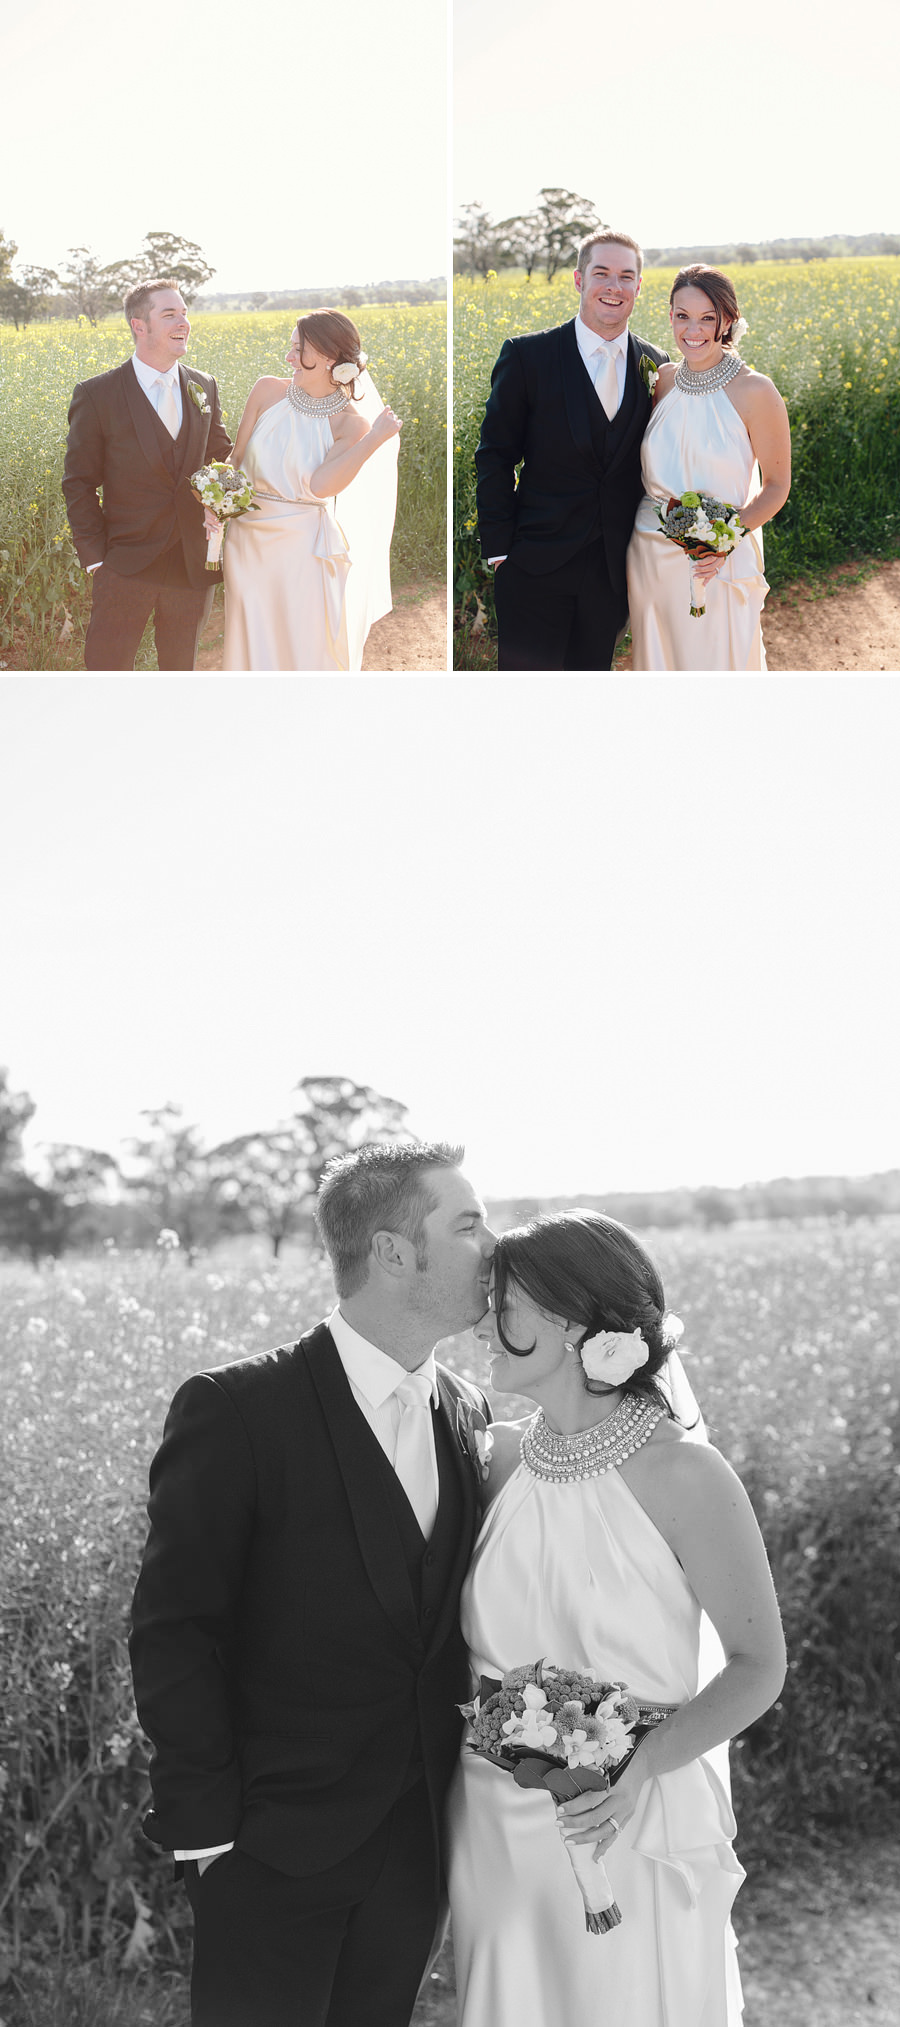 Fine Art Wedding Photographer: Bridal Party Portraits